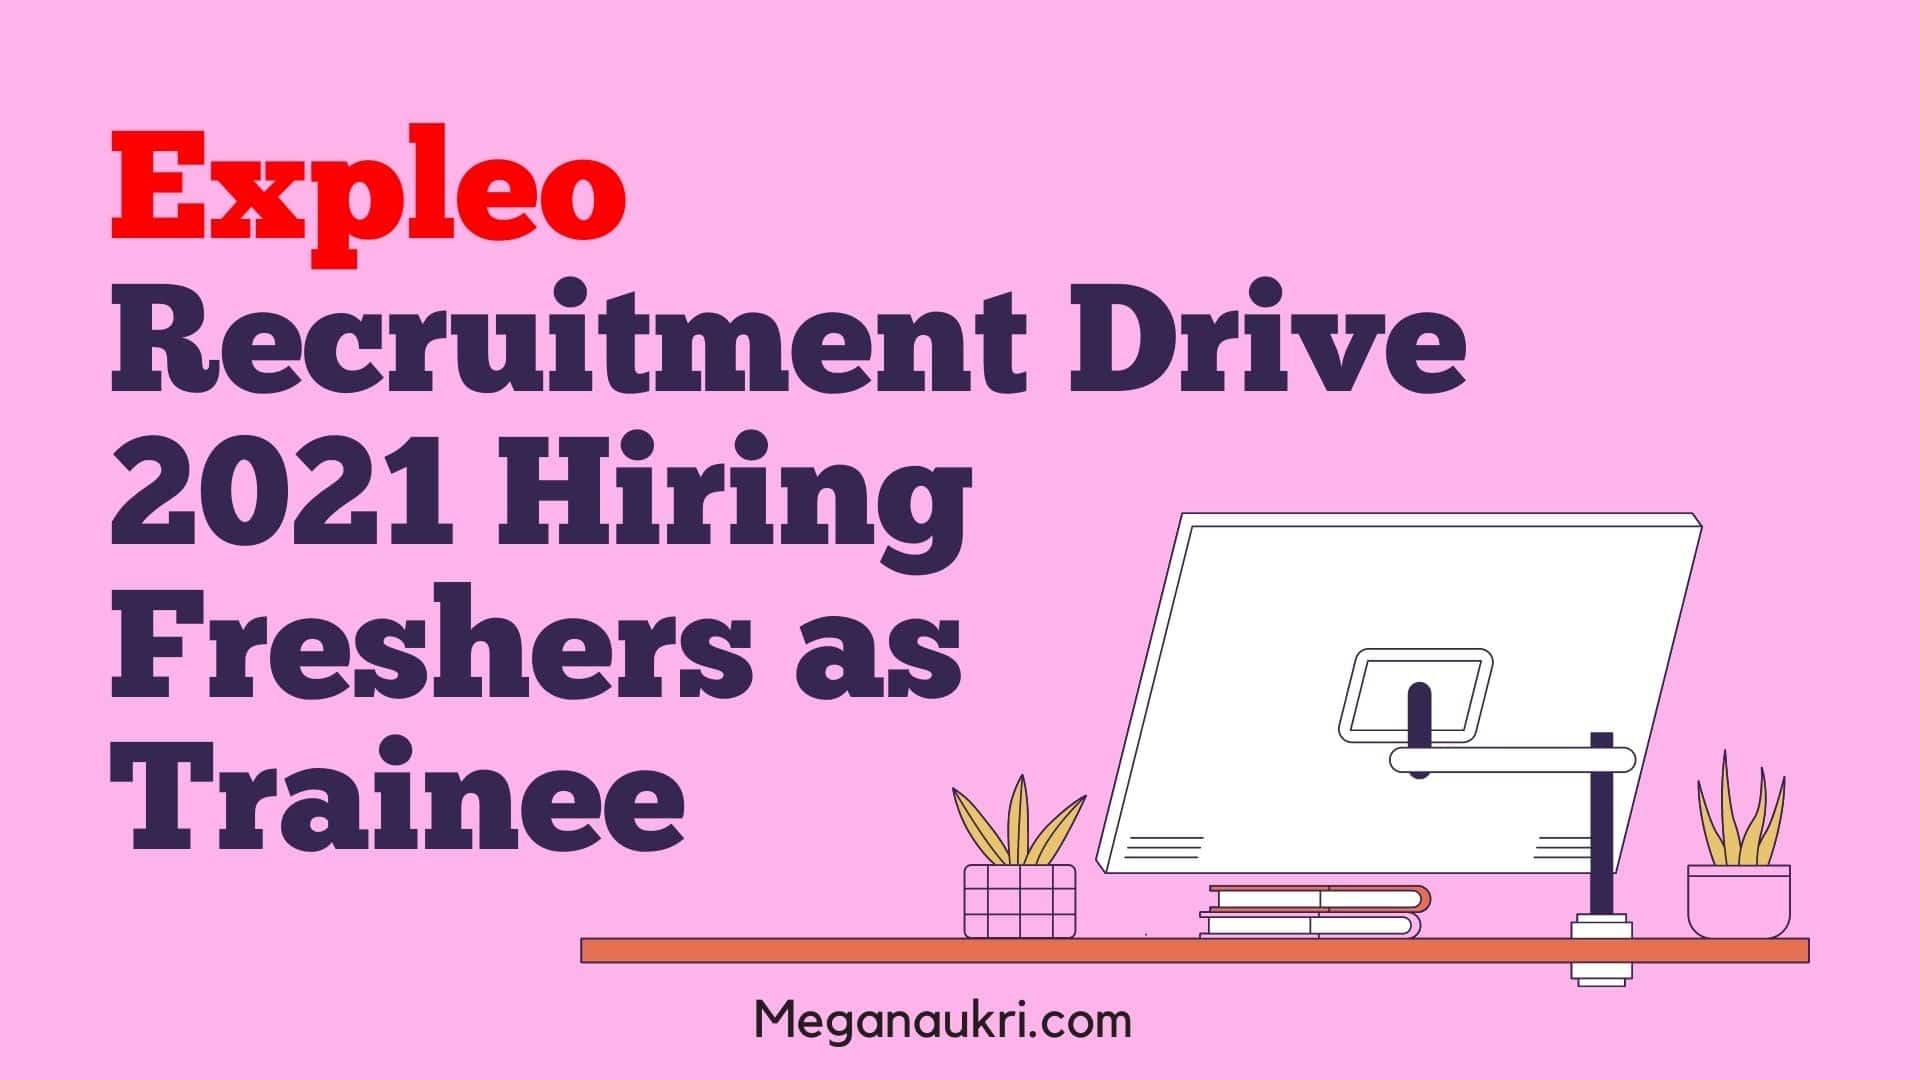 Expleo-Recruitment-Drive-2021-Hiring-Freshers-as-Trainee